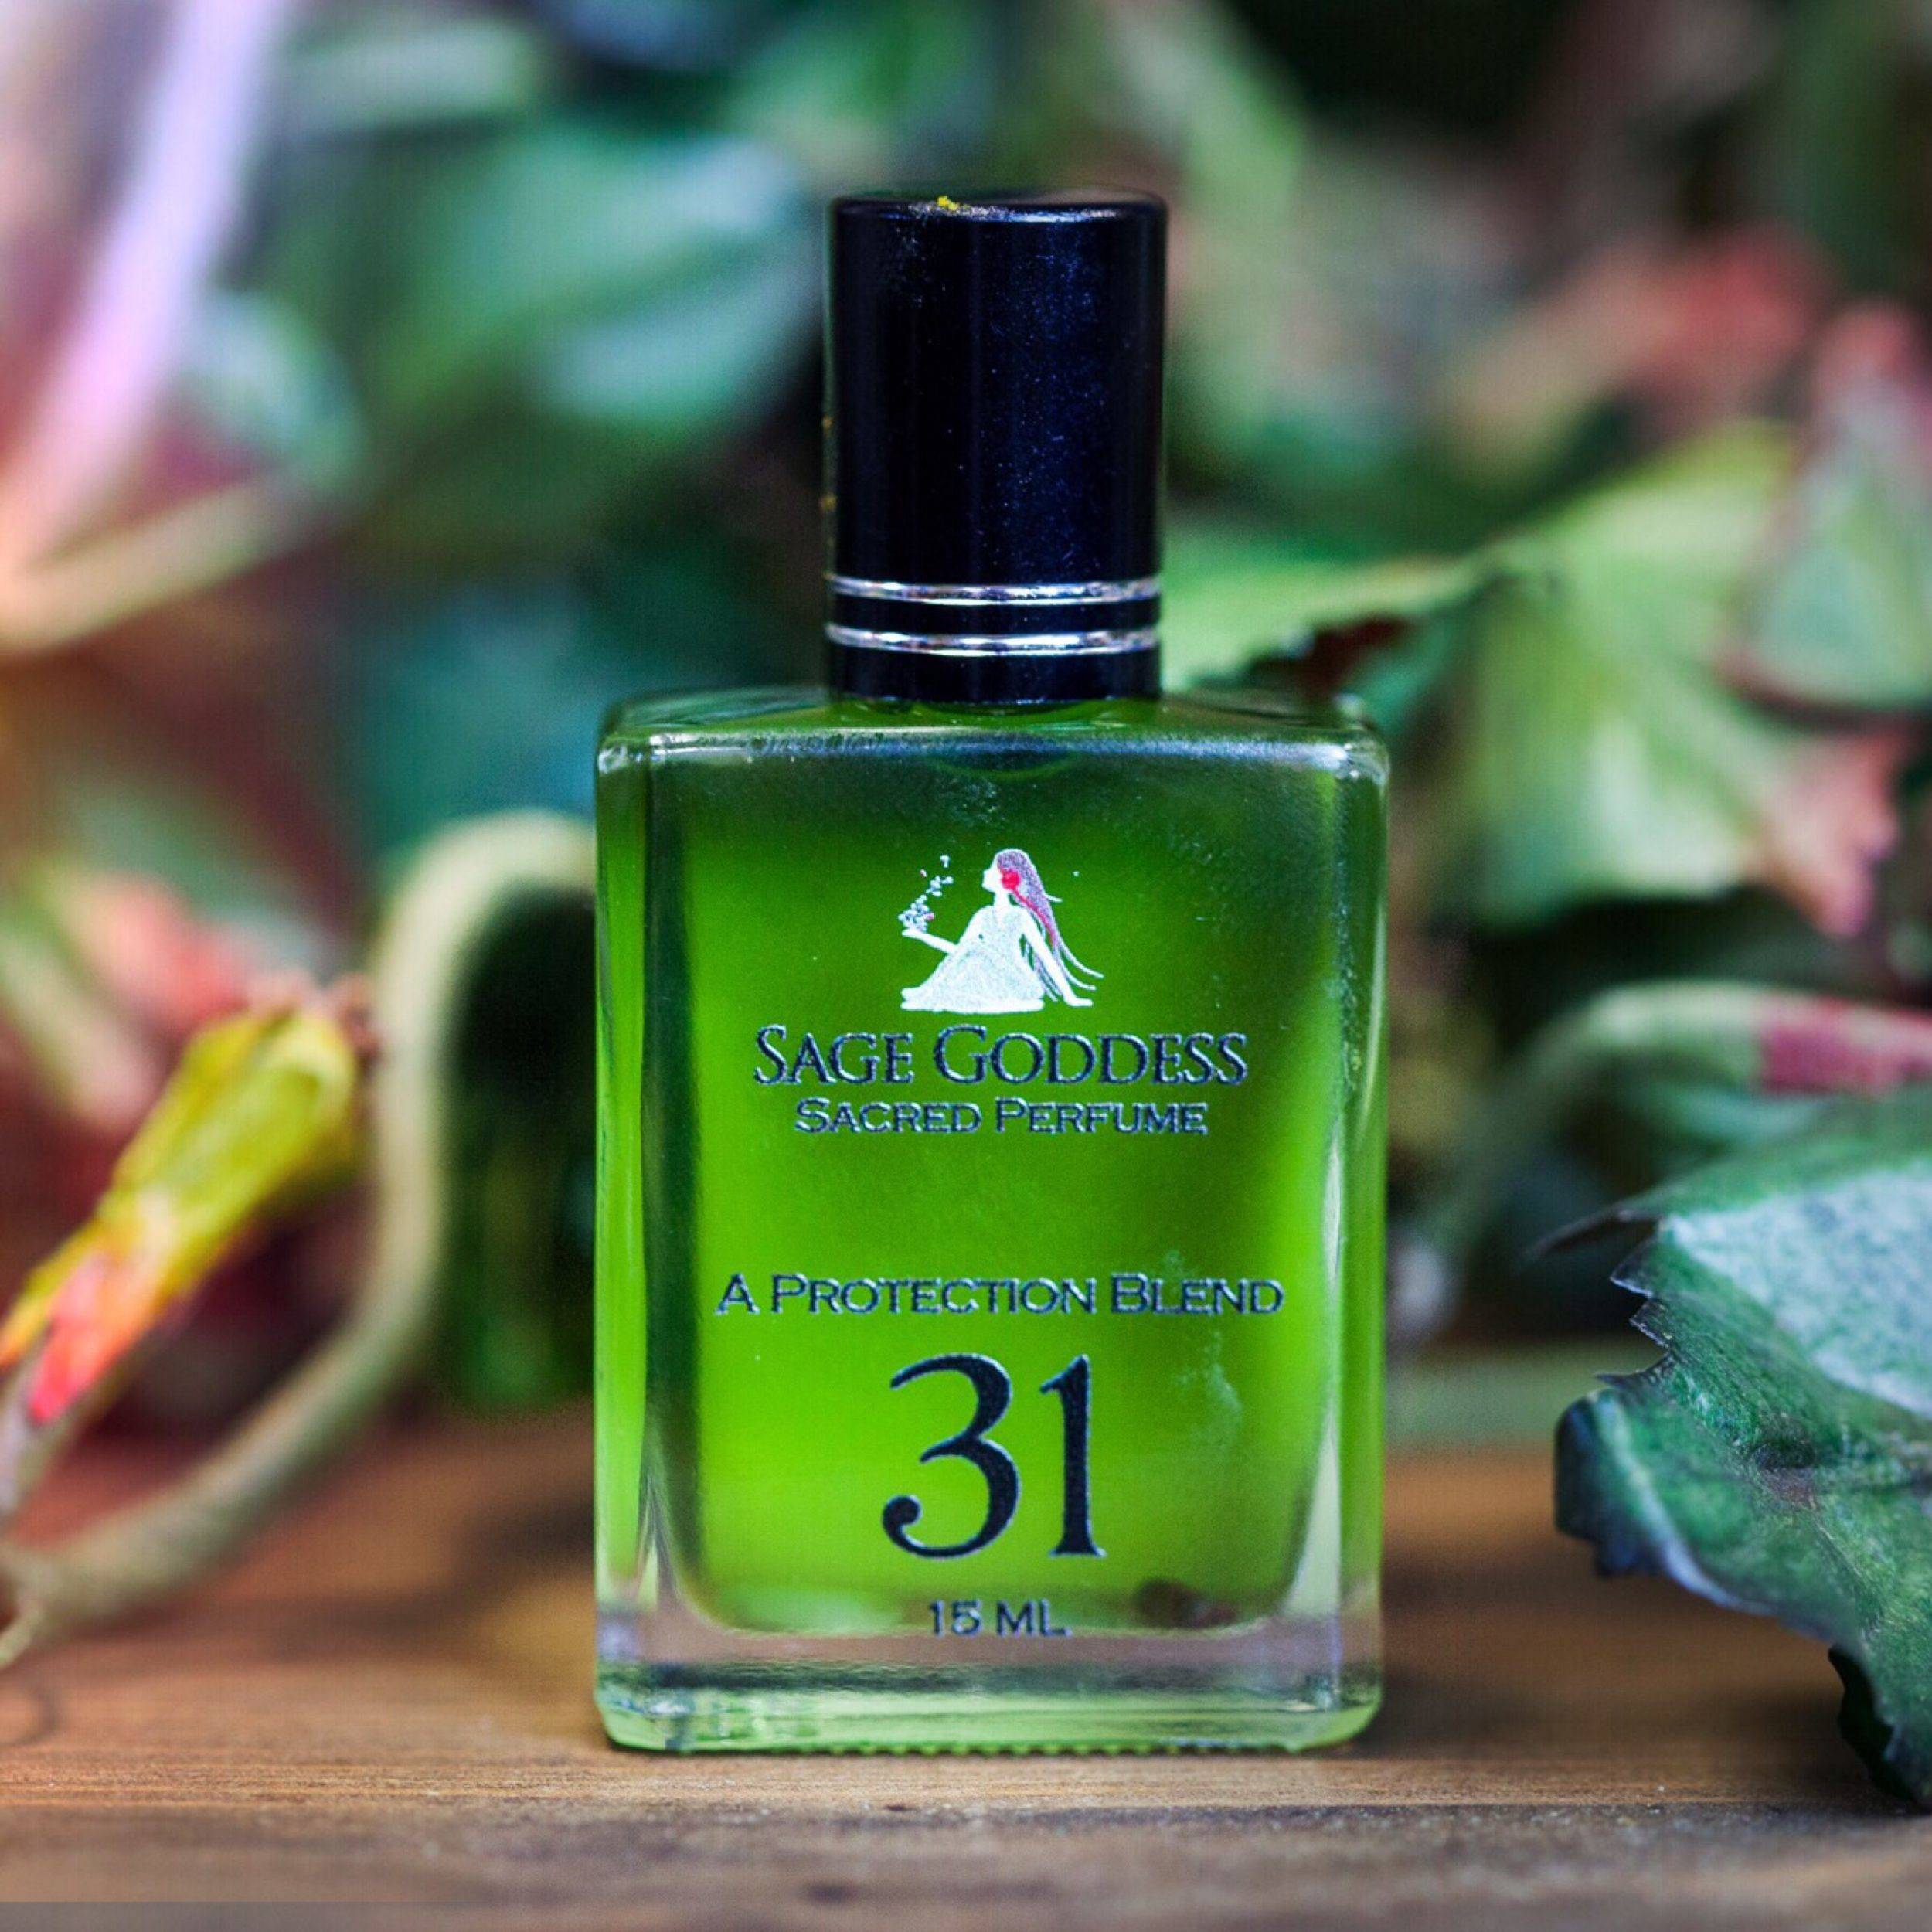 31 Perfume *